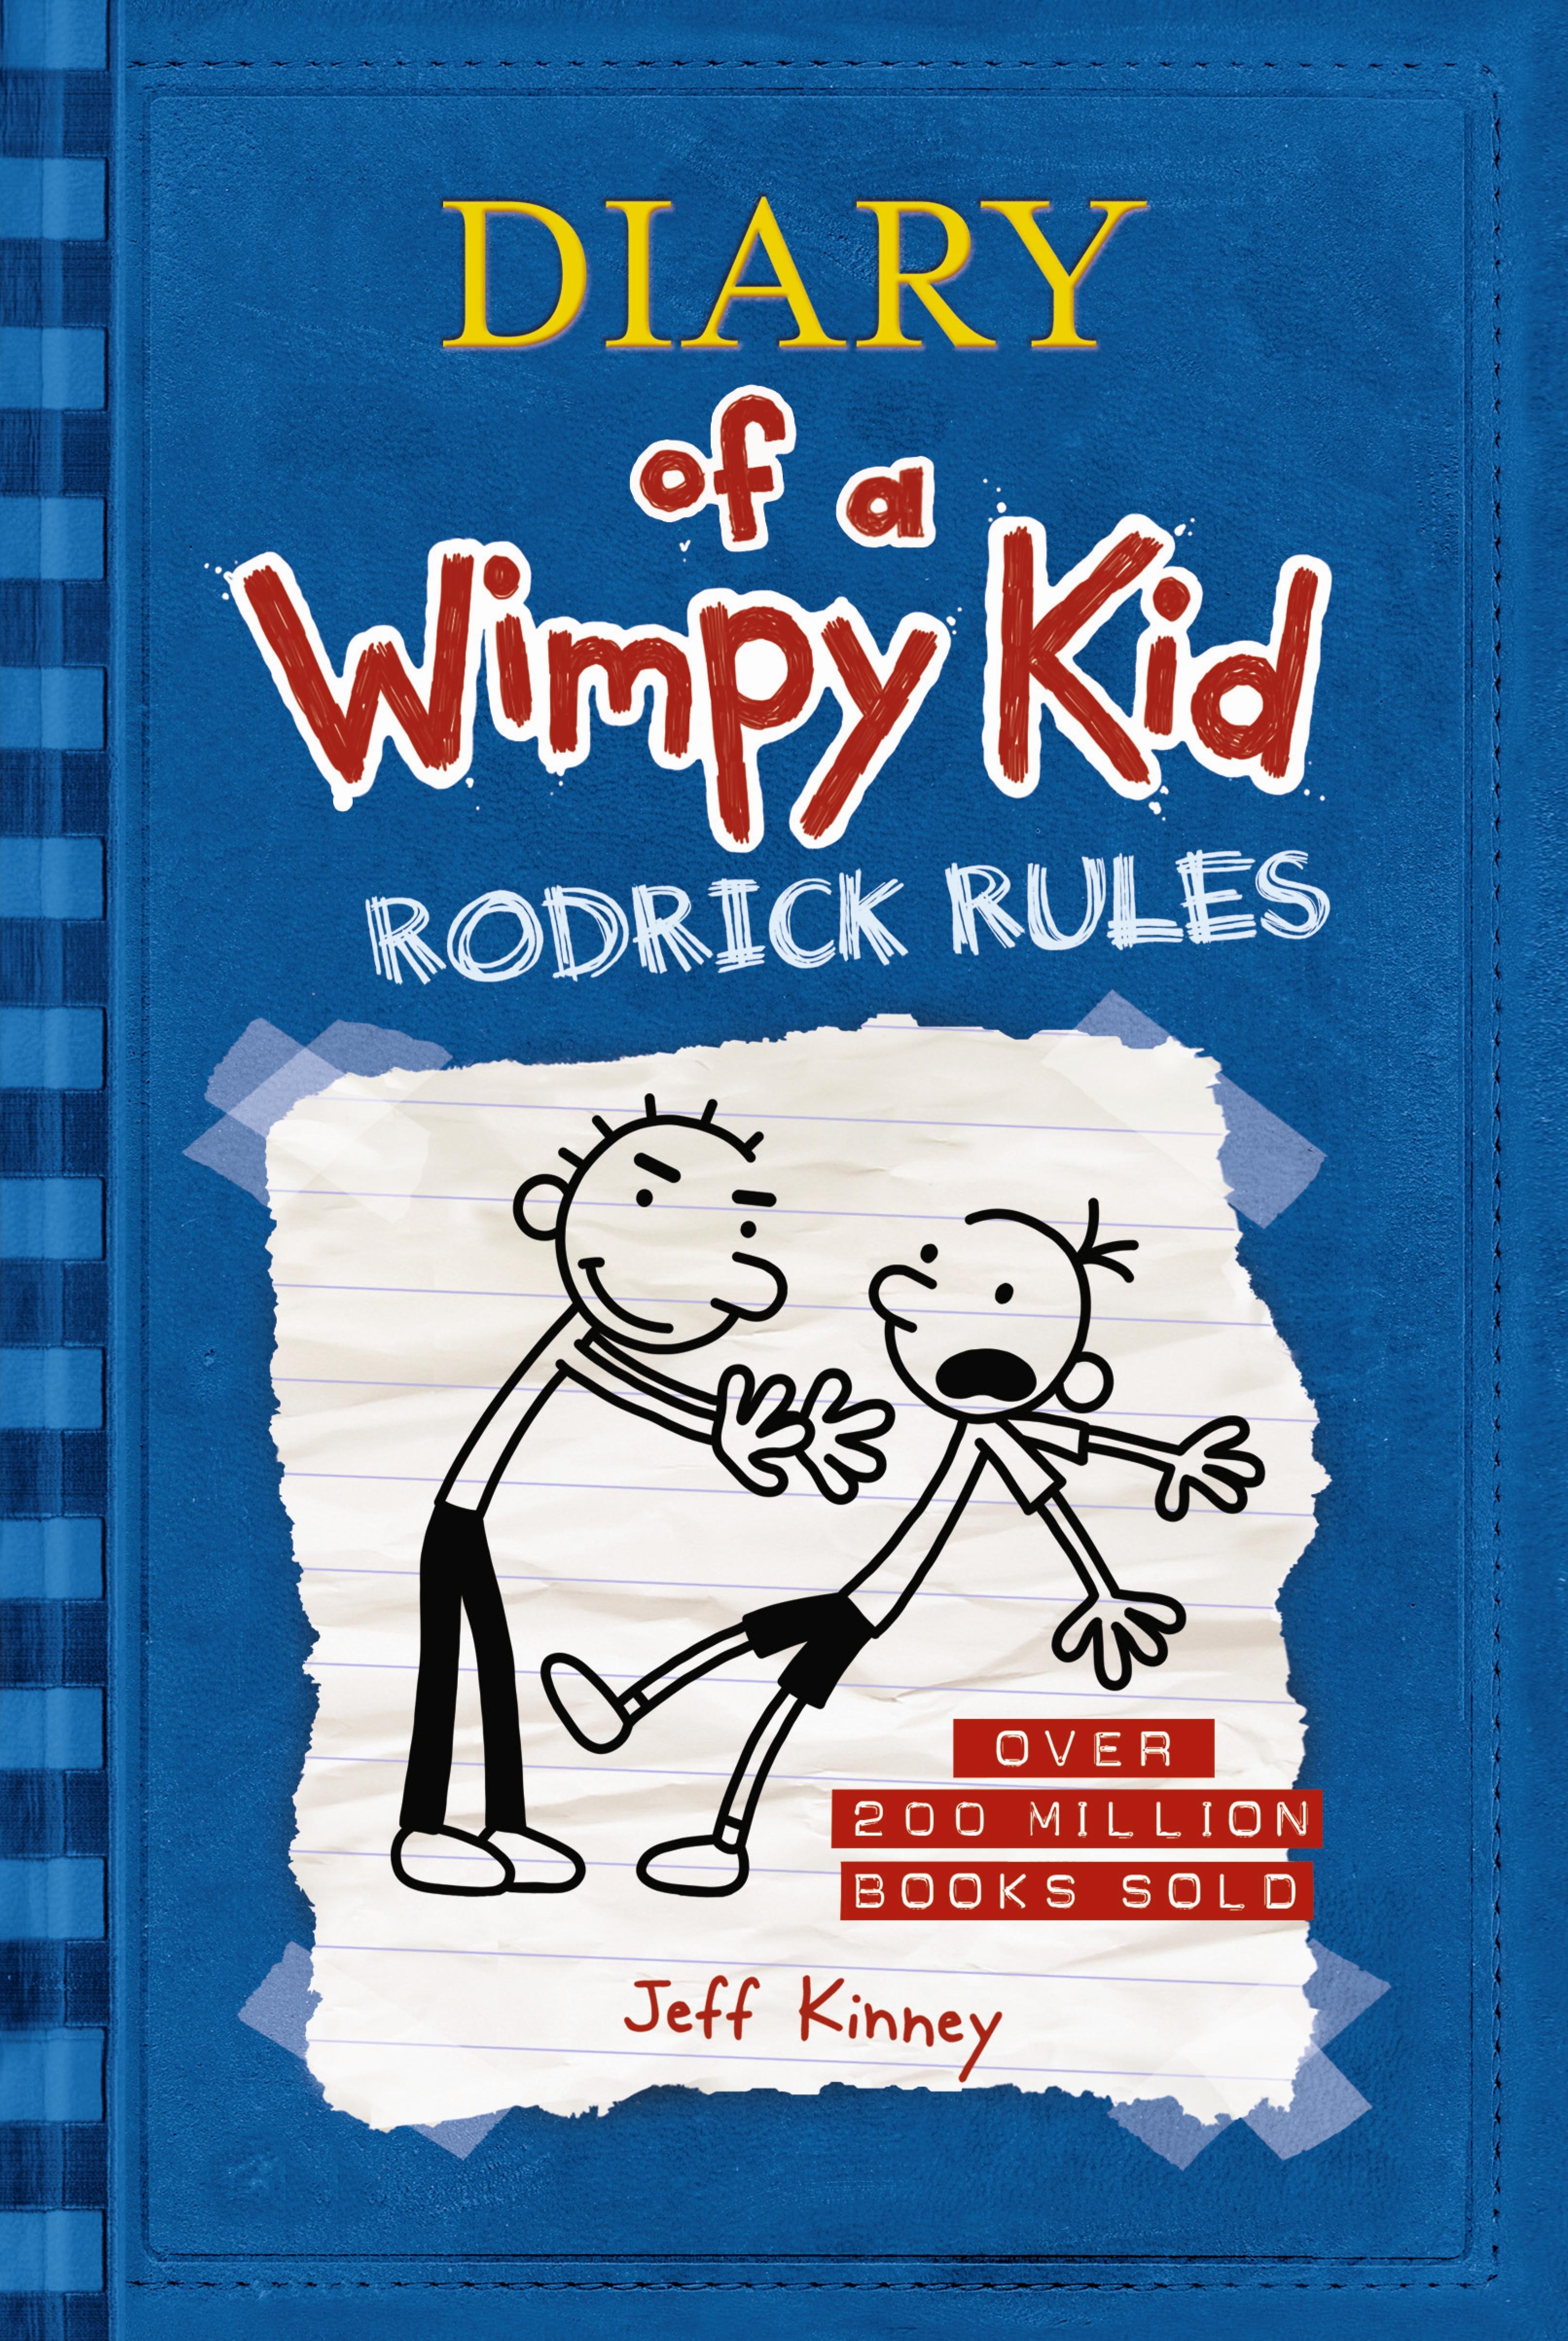 Rodrick Rules: Diary of a Wimpy Kid | Penguin Books Australia